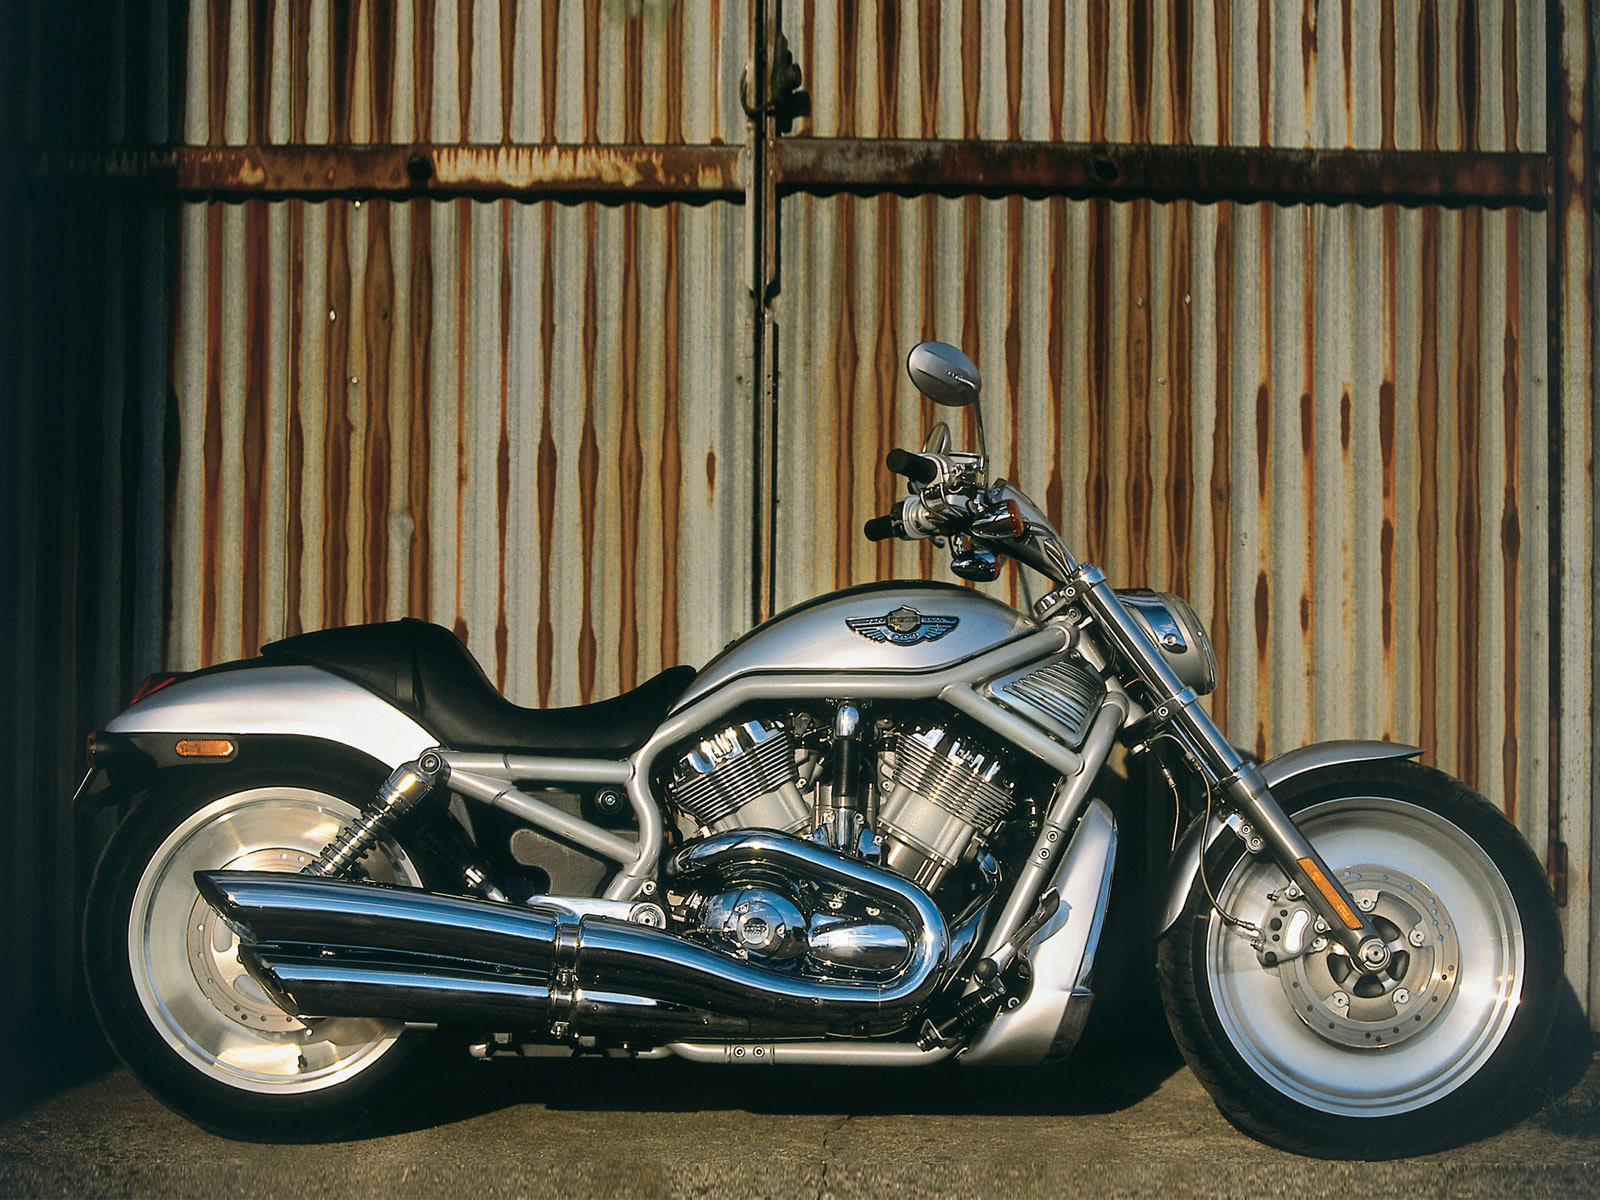 Harley Davidson: 2003 Harley-Davidson VRSCA V-Rod Accident Lawyers Info